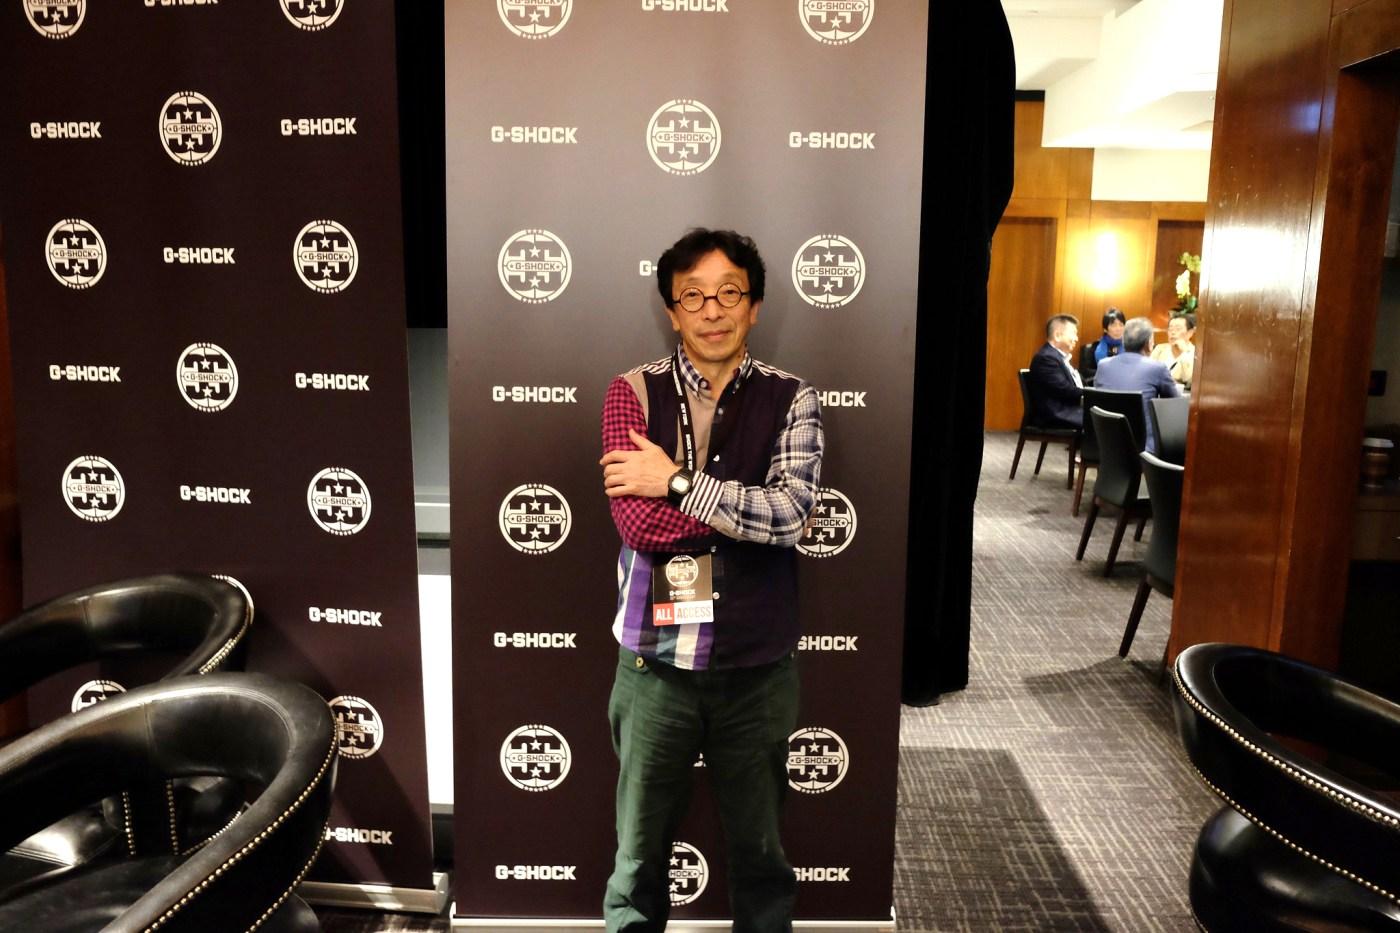 Kikuo Ibe, creator of the original G-Shock in 1983